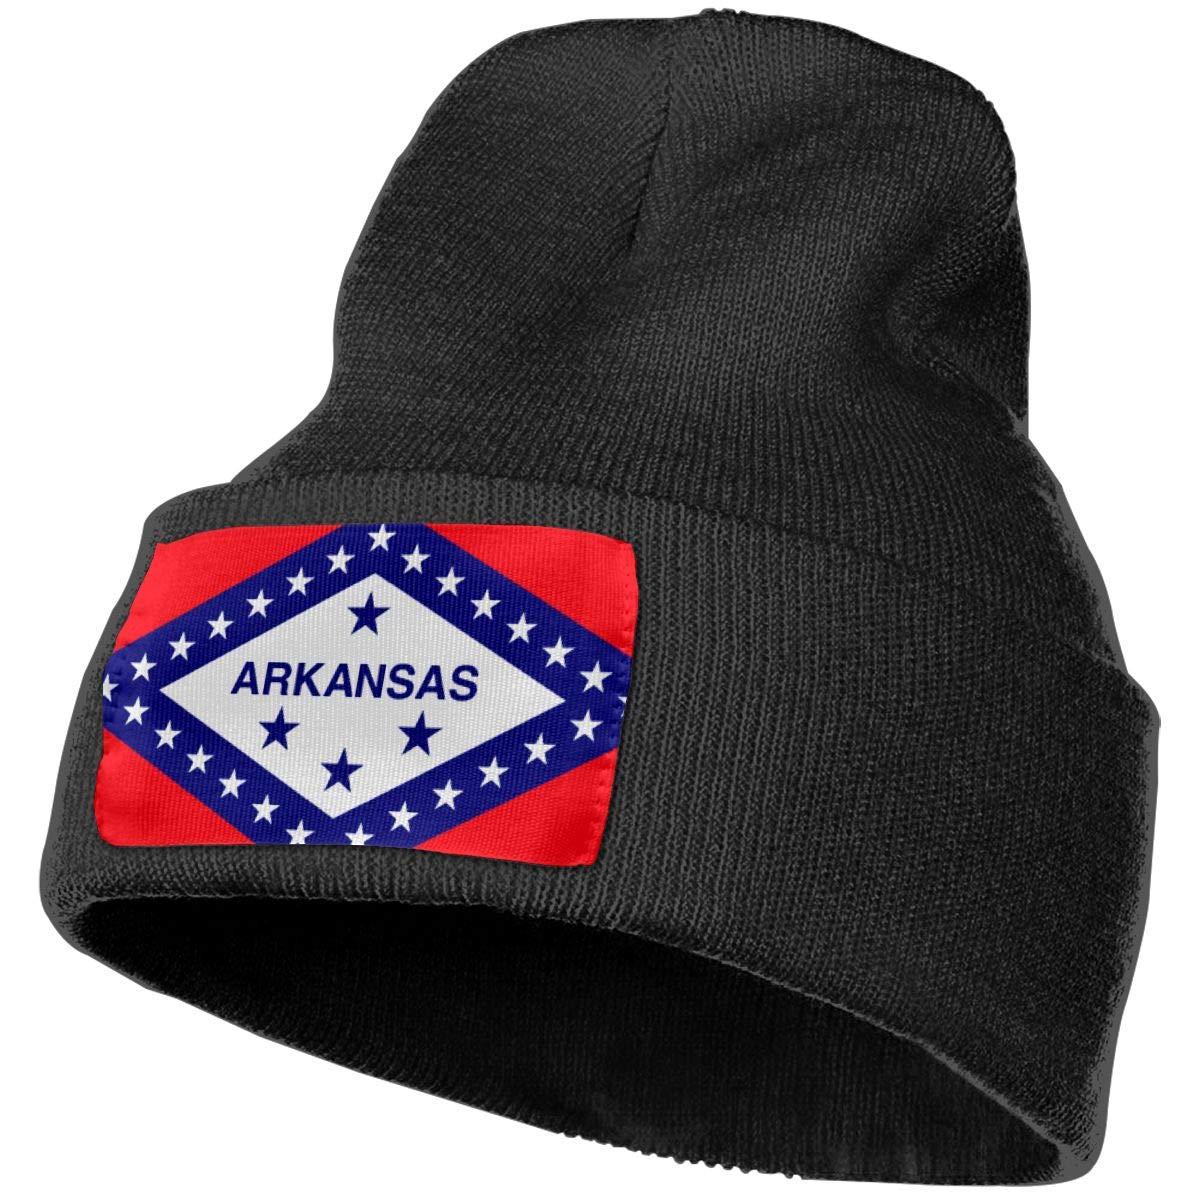 COJOP Arkansas Winter Beanie Unisex Cuffed Plain Skull Knit Hat Cap